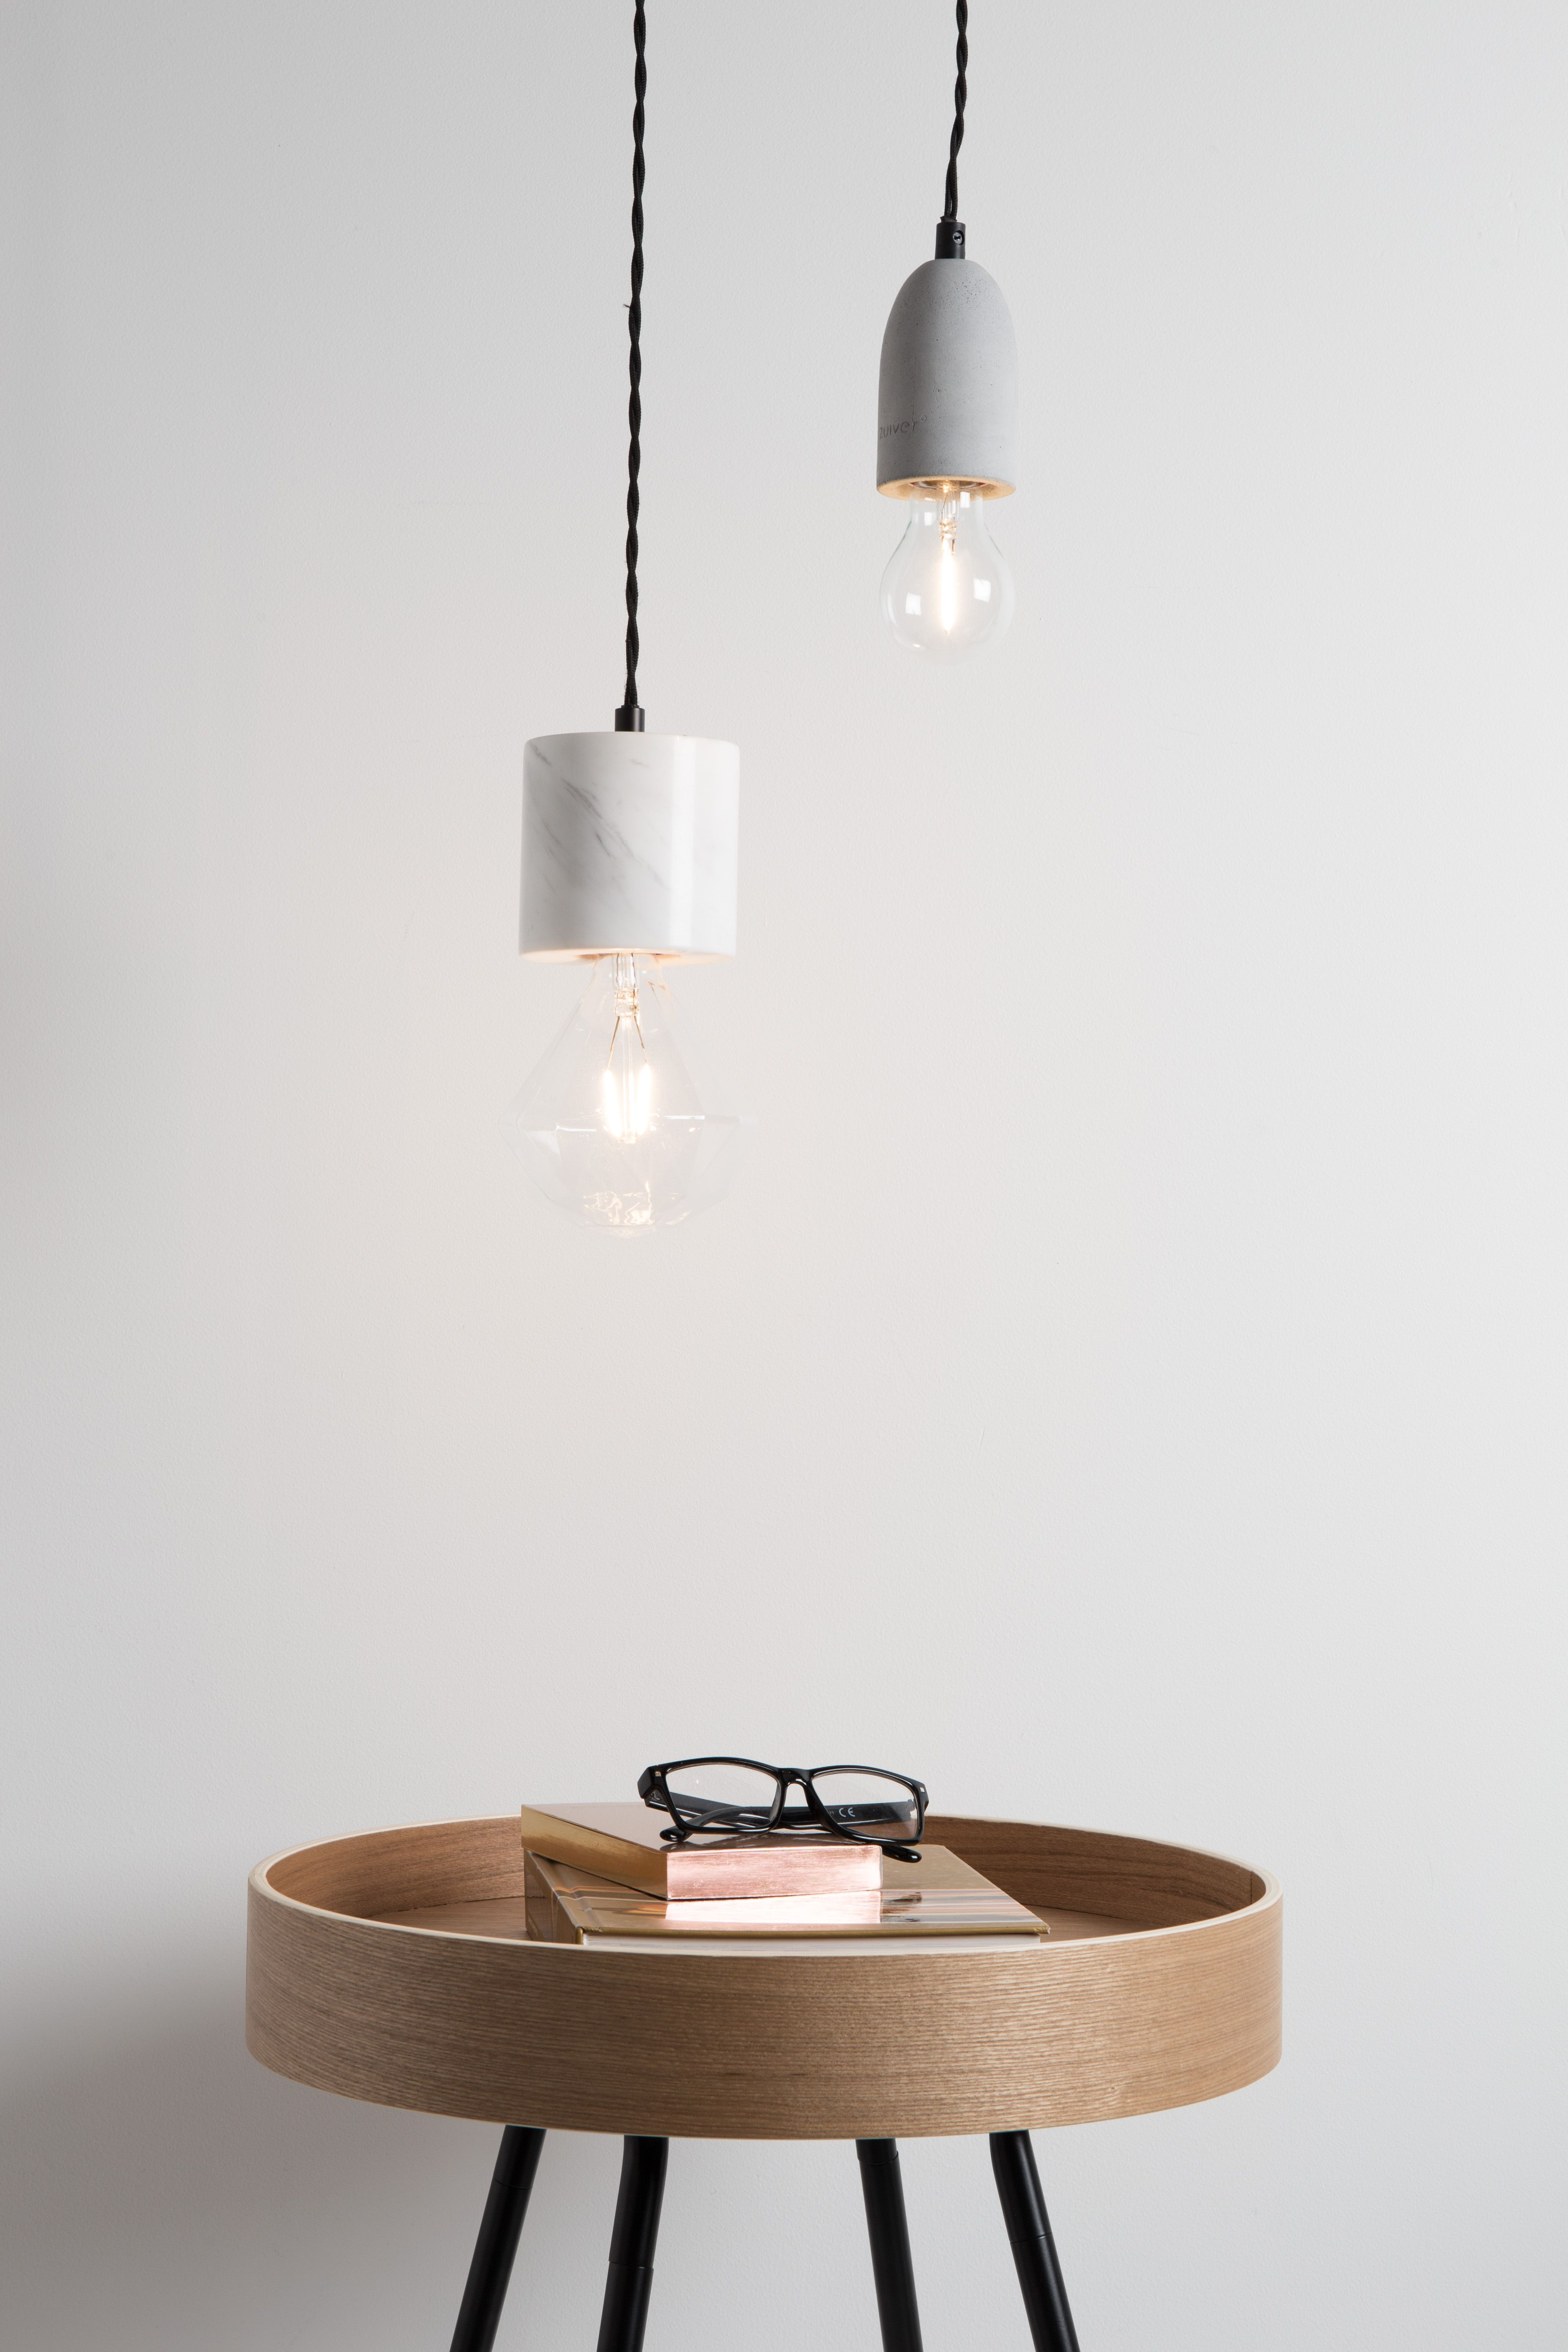 Trust Pendant Lamp Hanging Lights Pendant Lamp Lighting